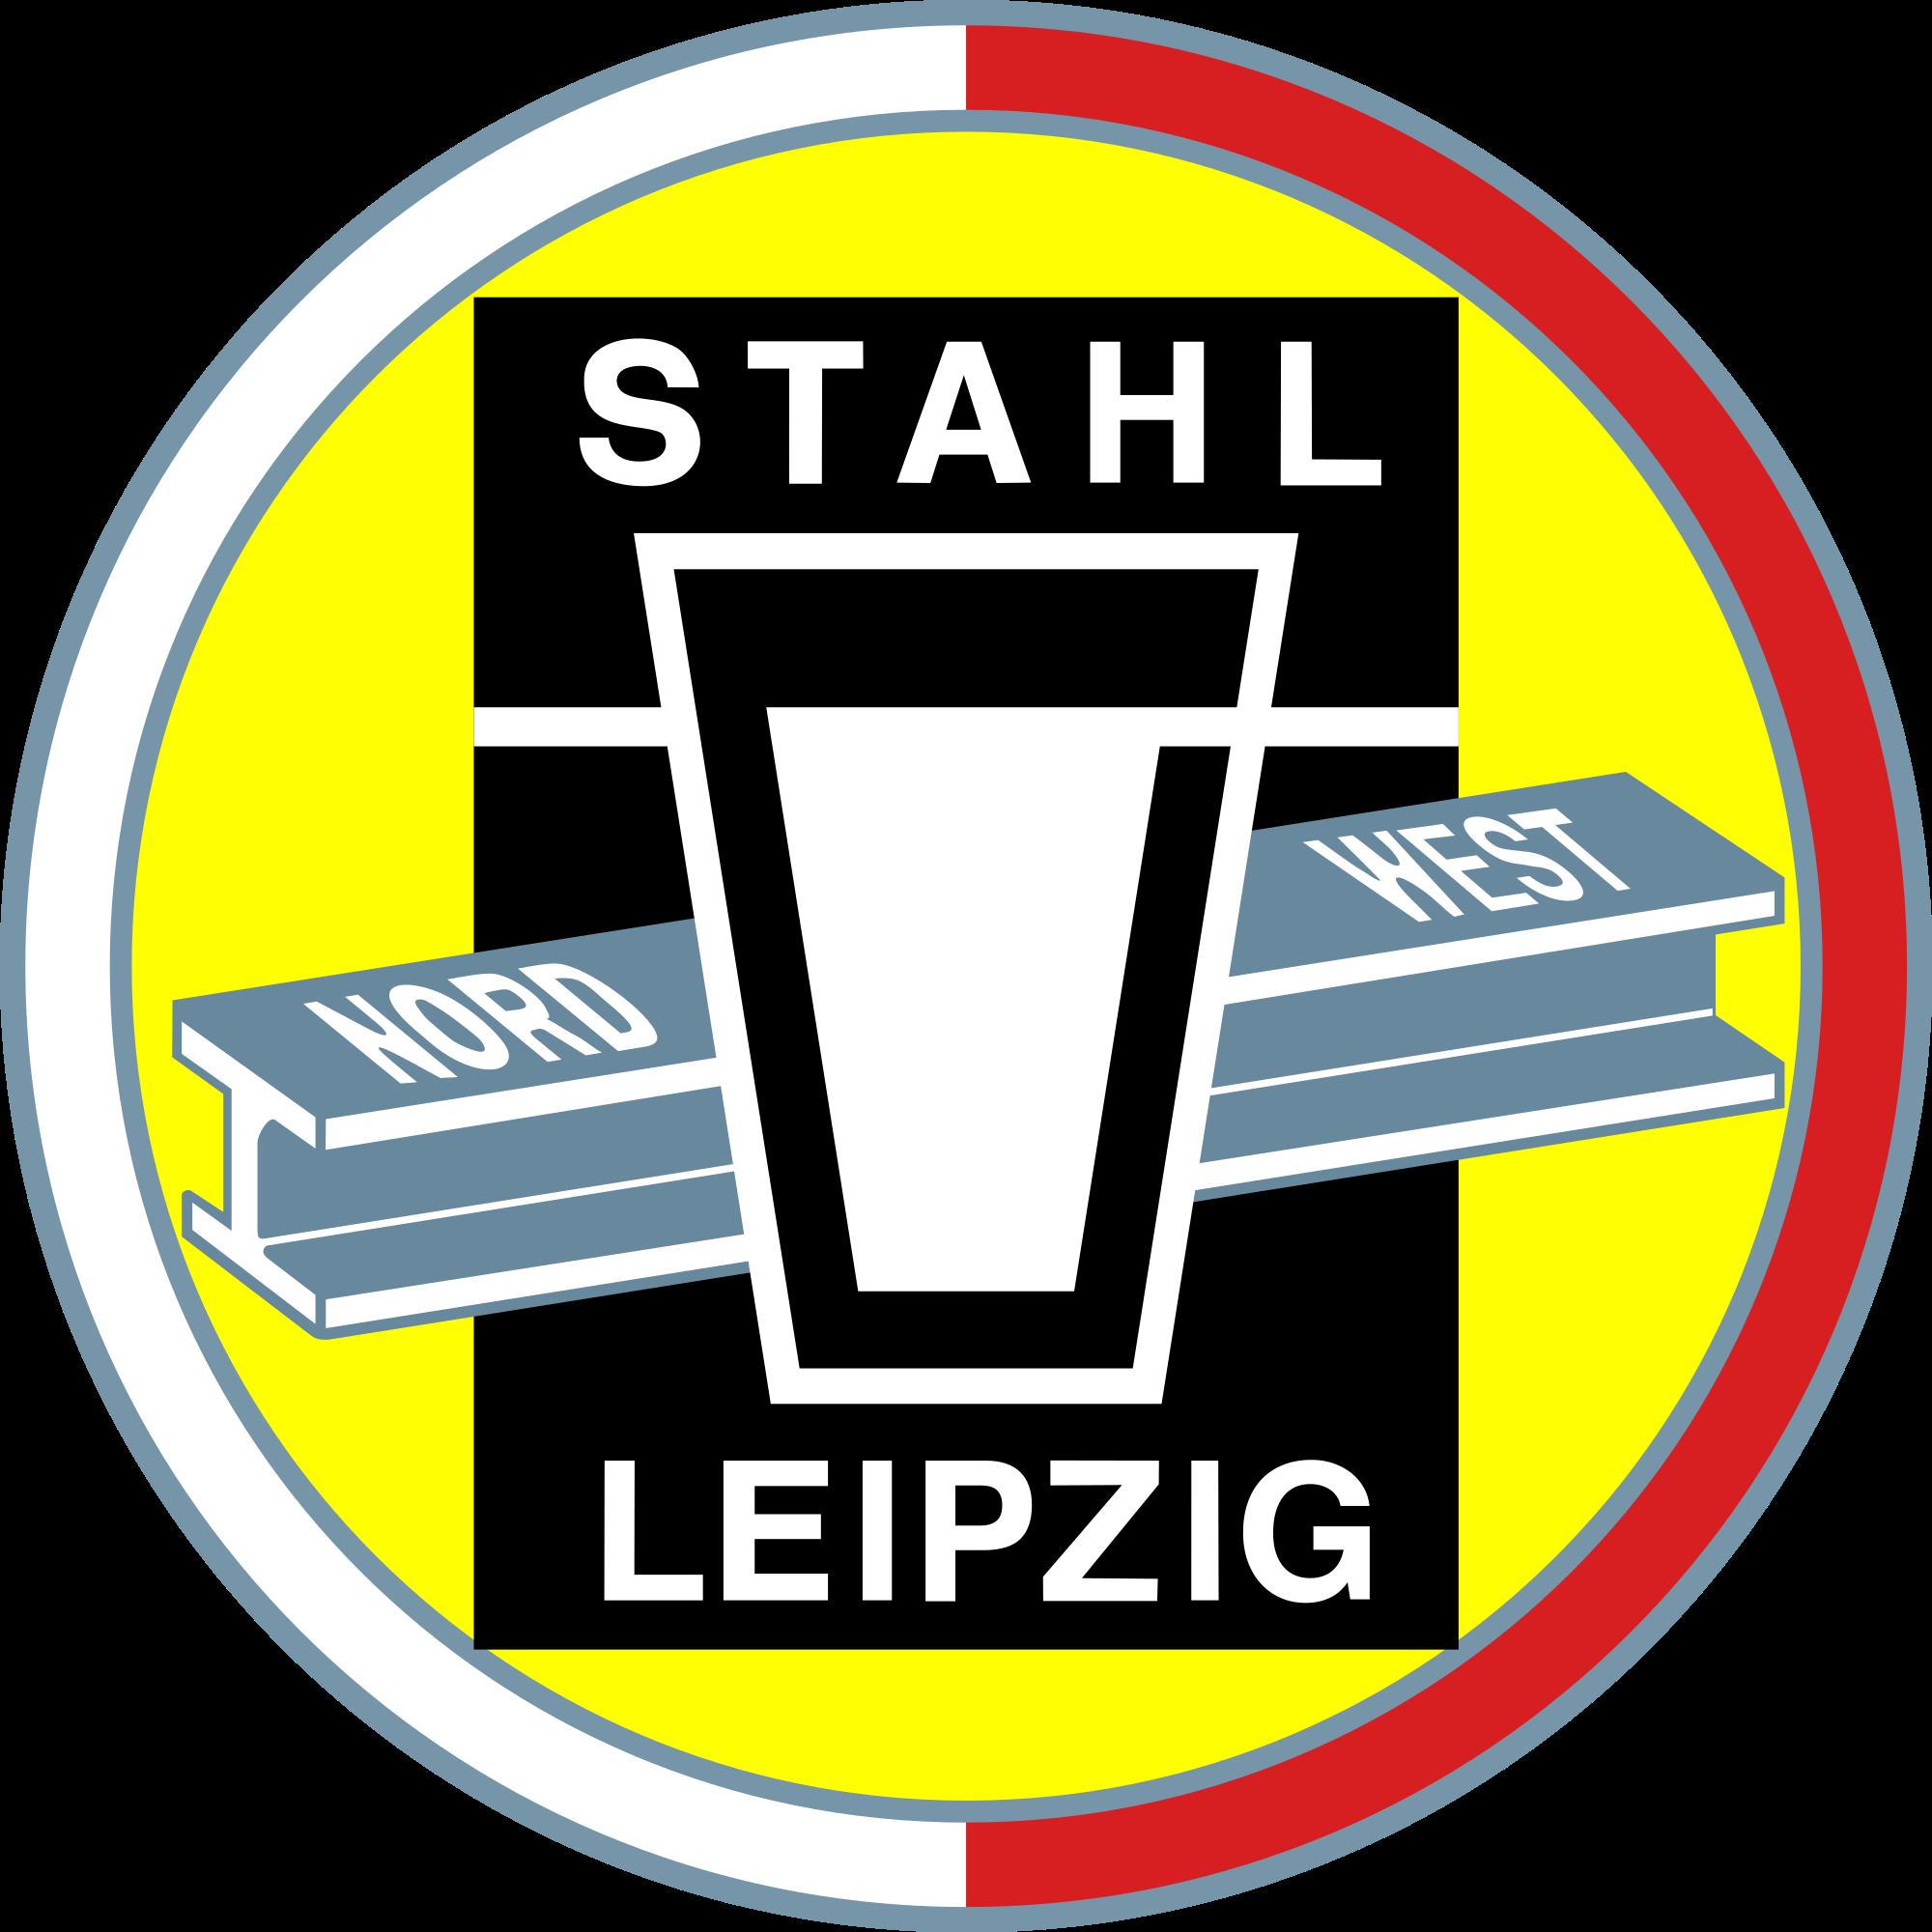 bsg-stahl-nordwest-leipzig